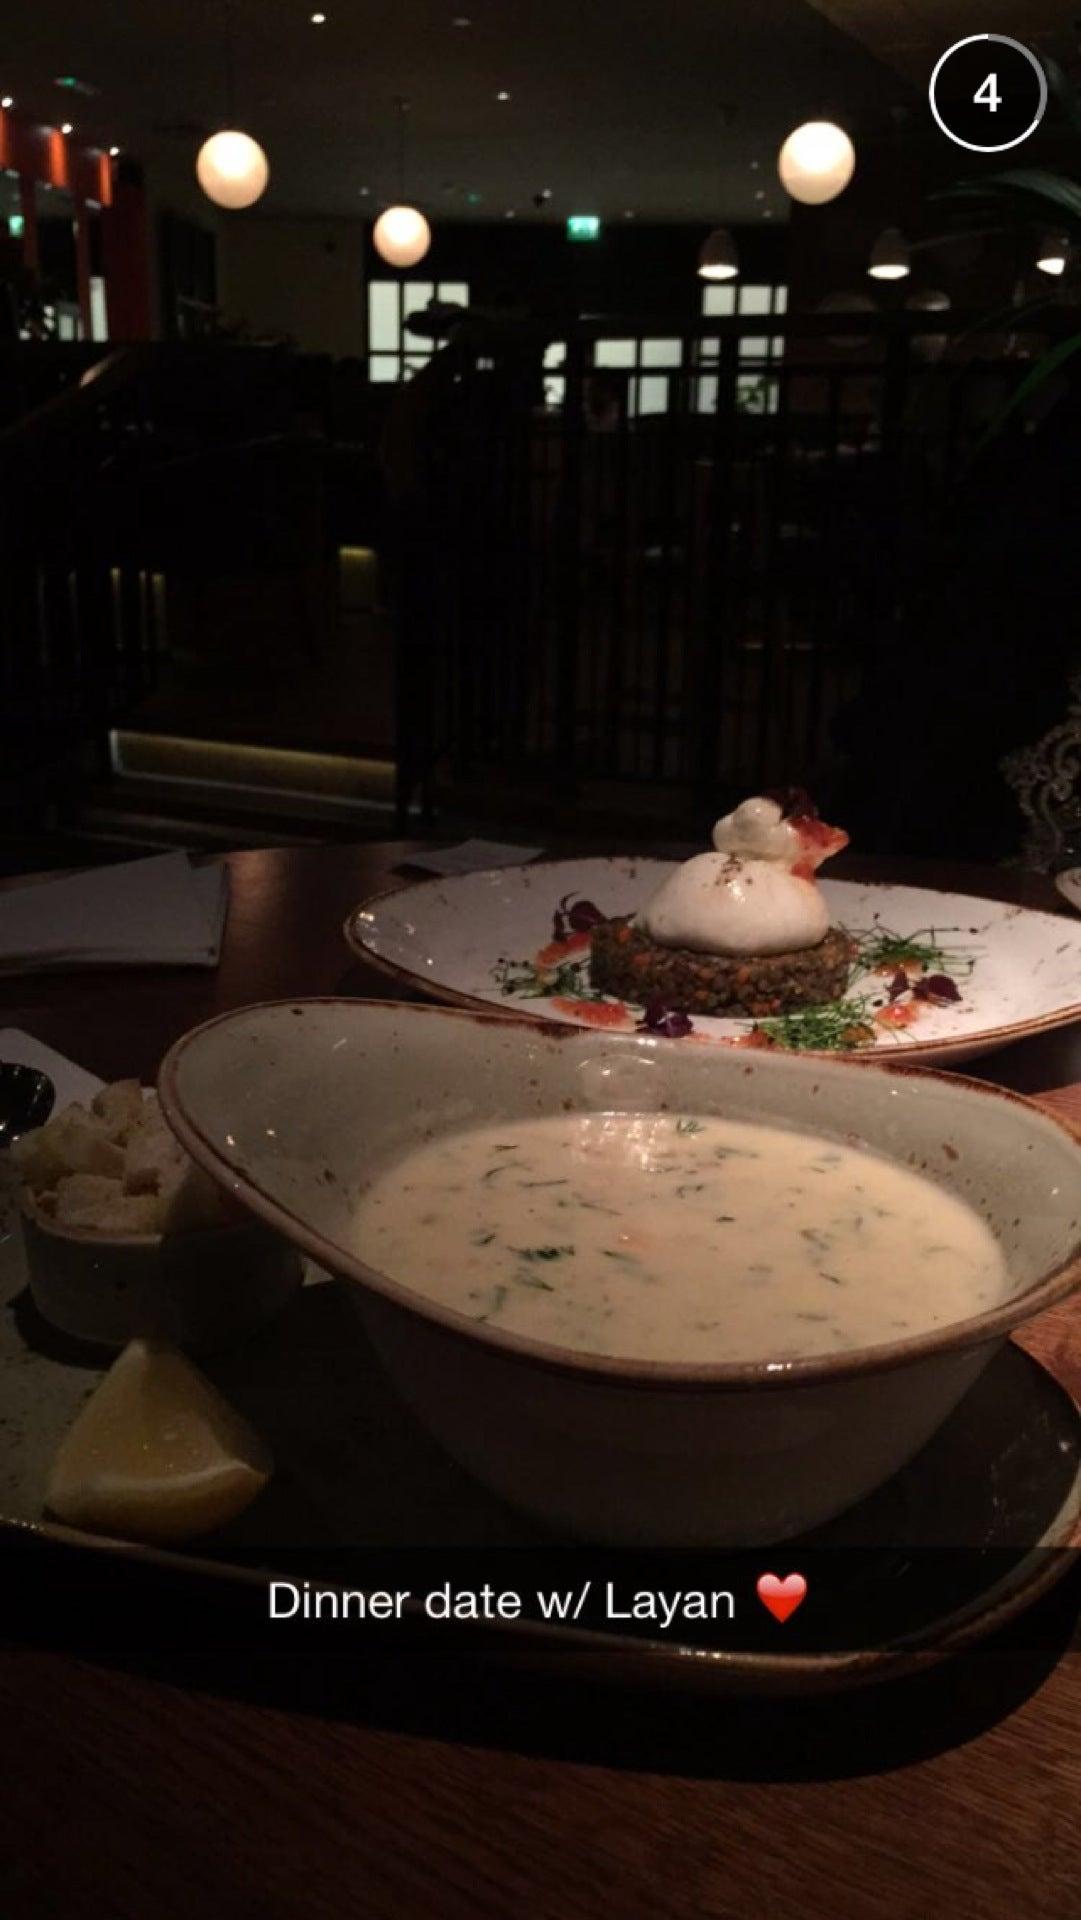 17920910_HQ7lg-IeqWG-F5AH4Z_h4TtpIAtRDI8oXq_Tx8TQX44 Incroyable De Table Bar Cuisine Conception